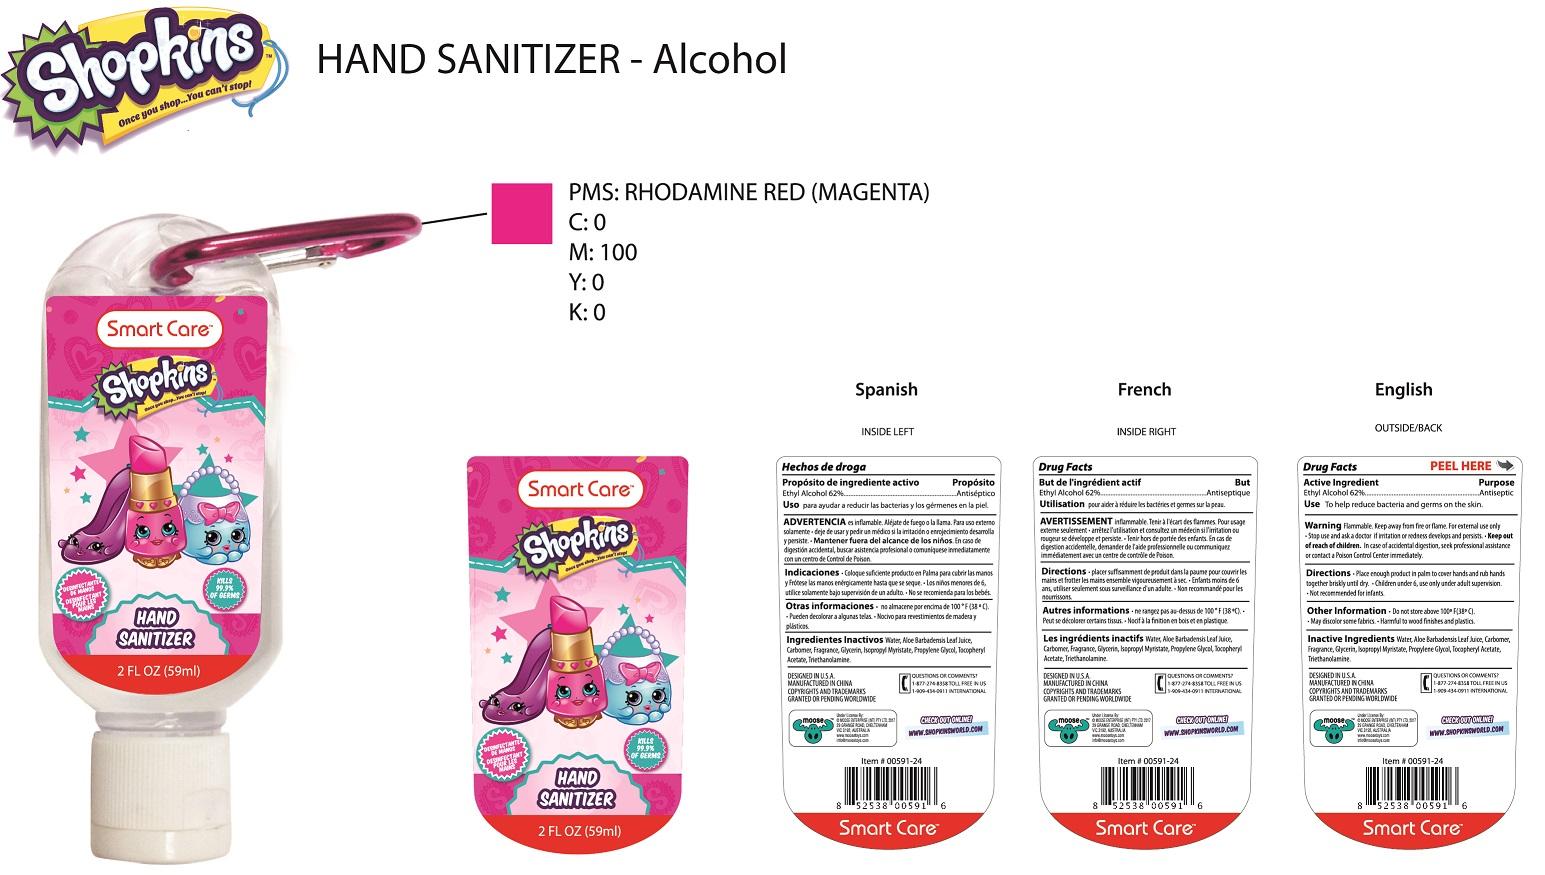 Ethyl Alcohol (Shopkins hand sanitizer)